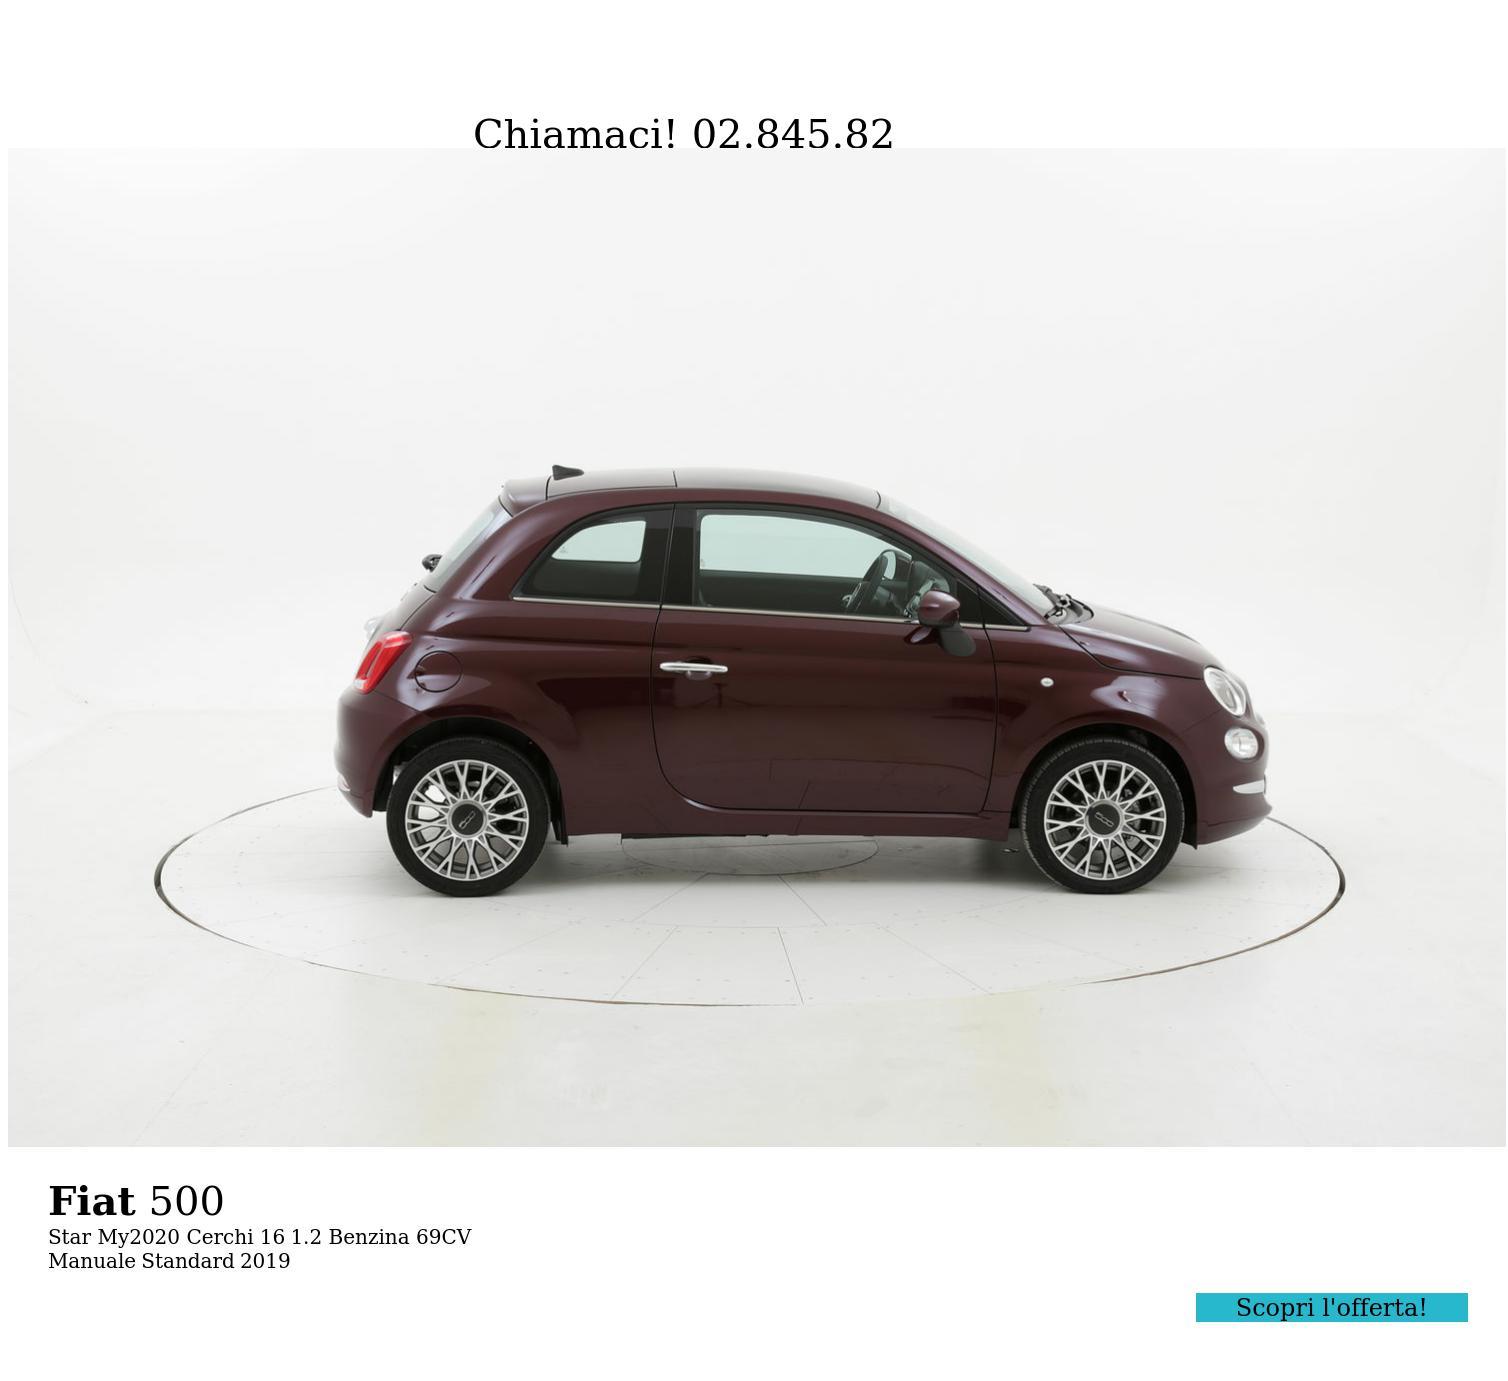 Fiat 500 Star My2020 Cerchi 16 km 0 benzina rossa scura | brumbrum